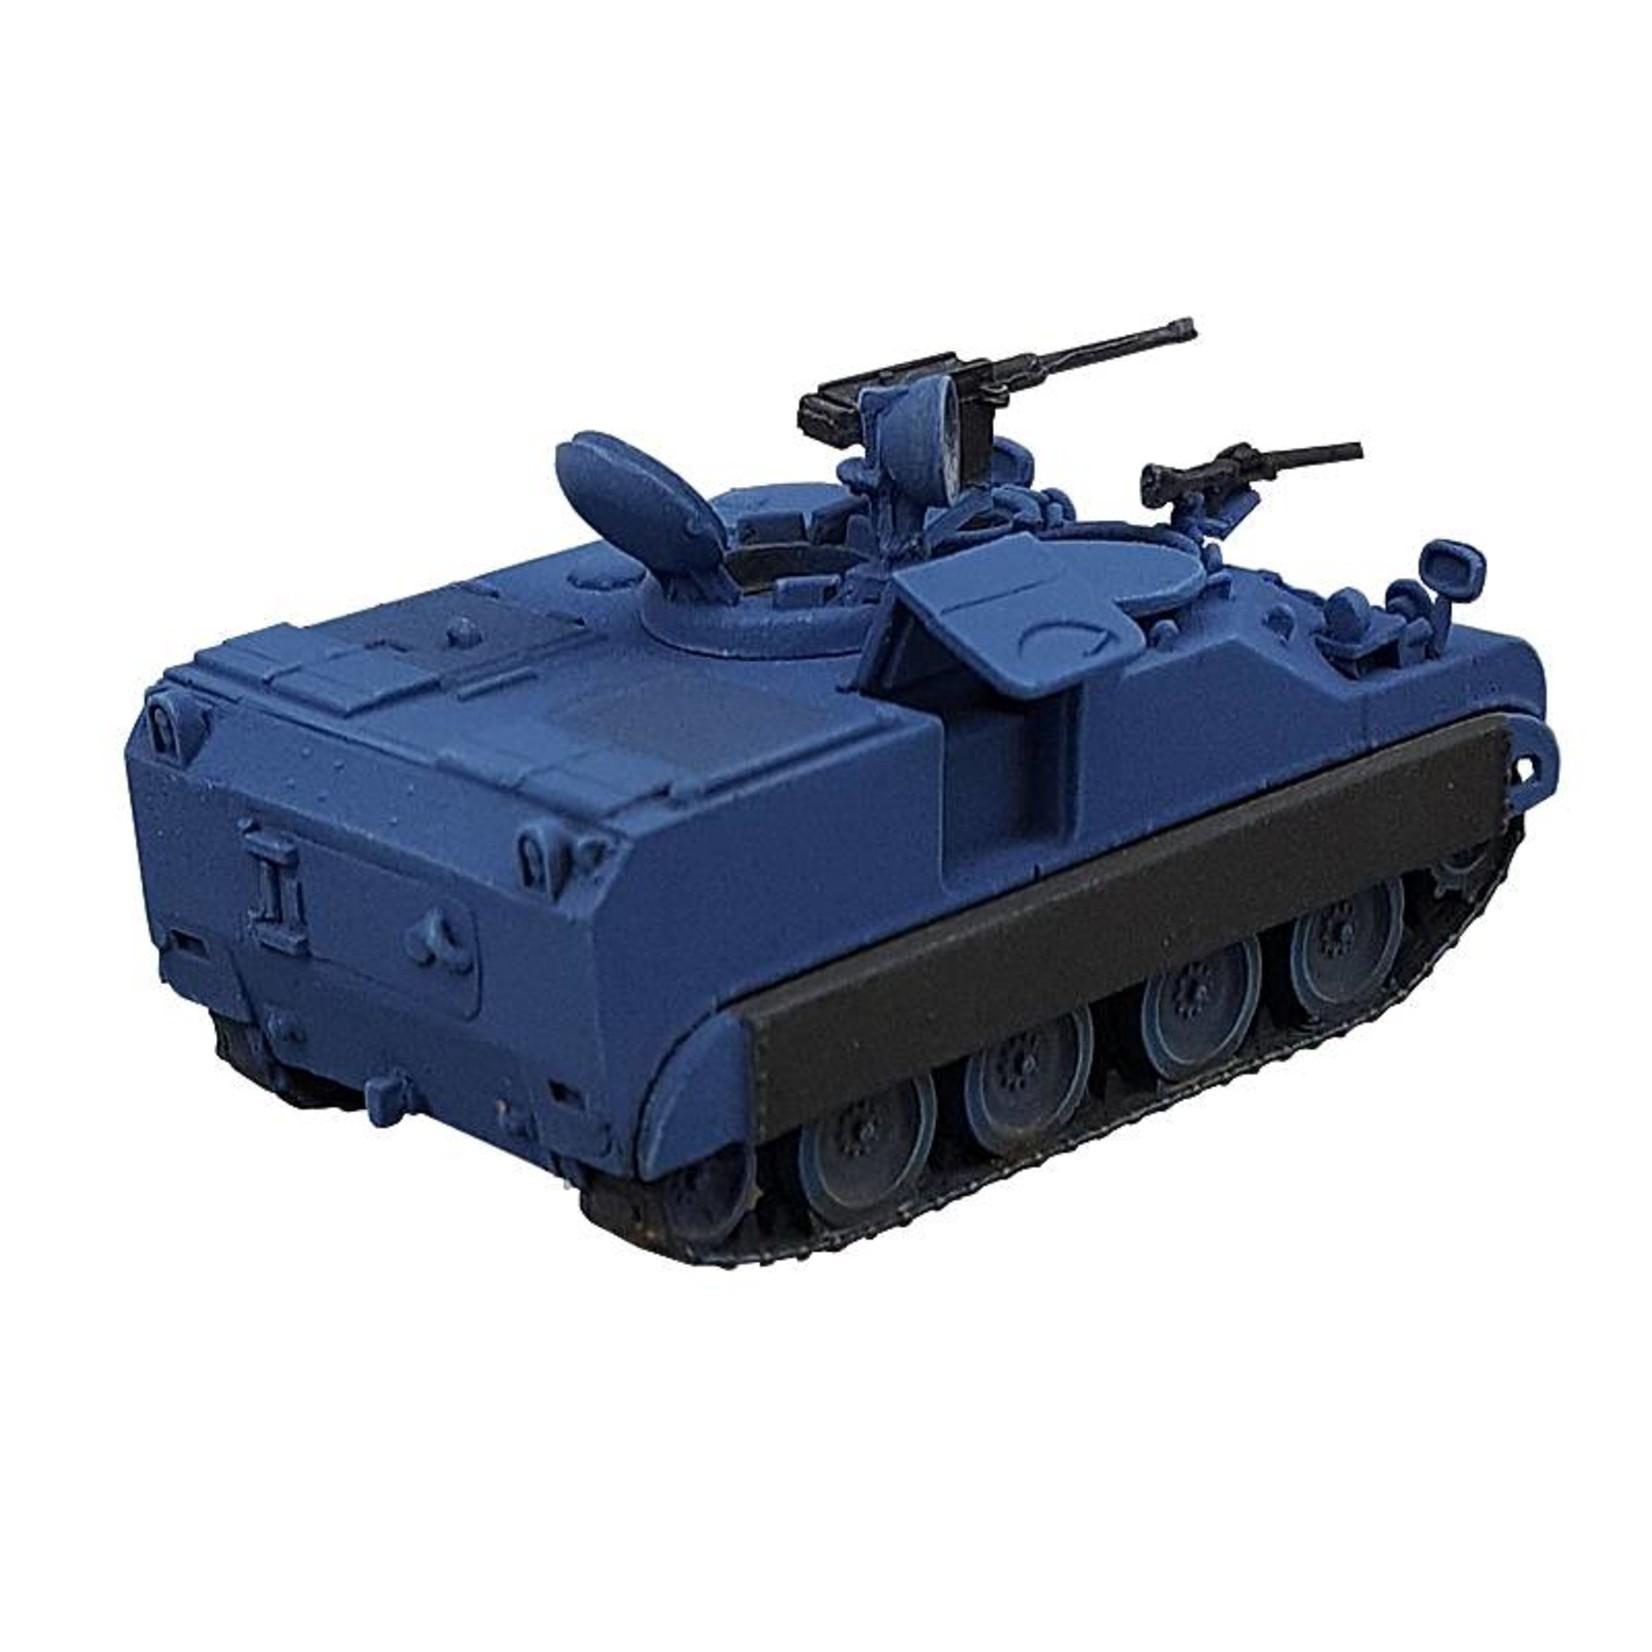 M113 Commando & Verkenning Caliber .50 KMar